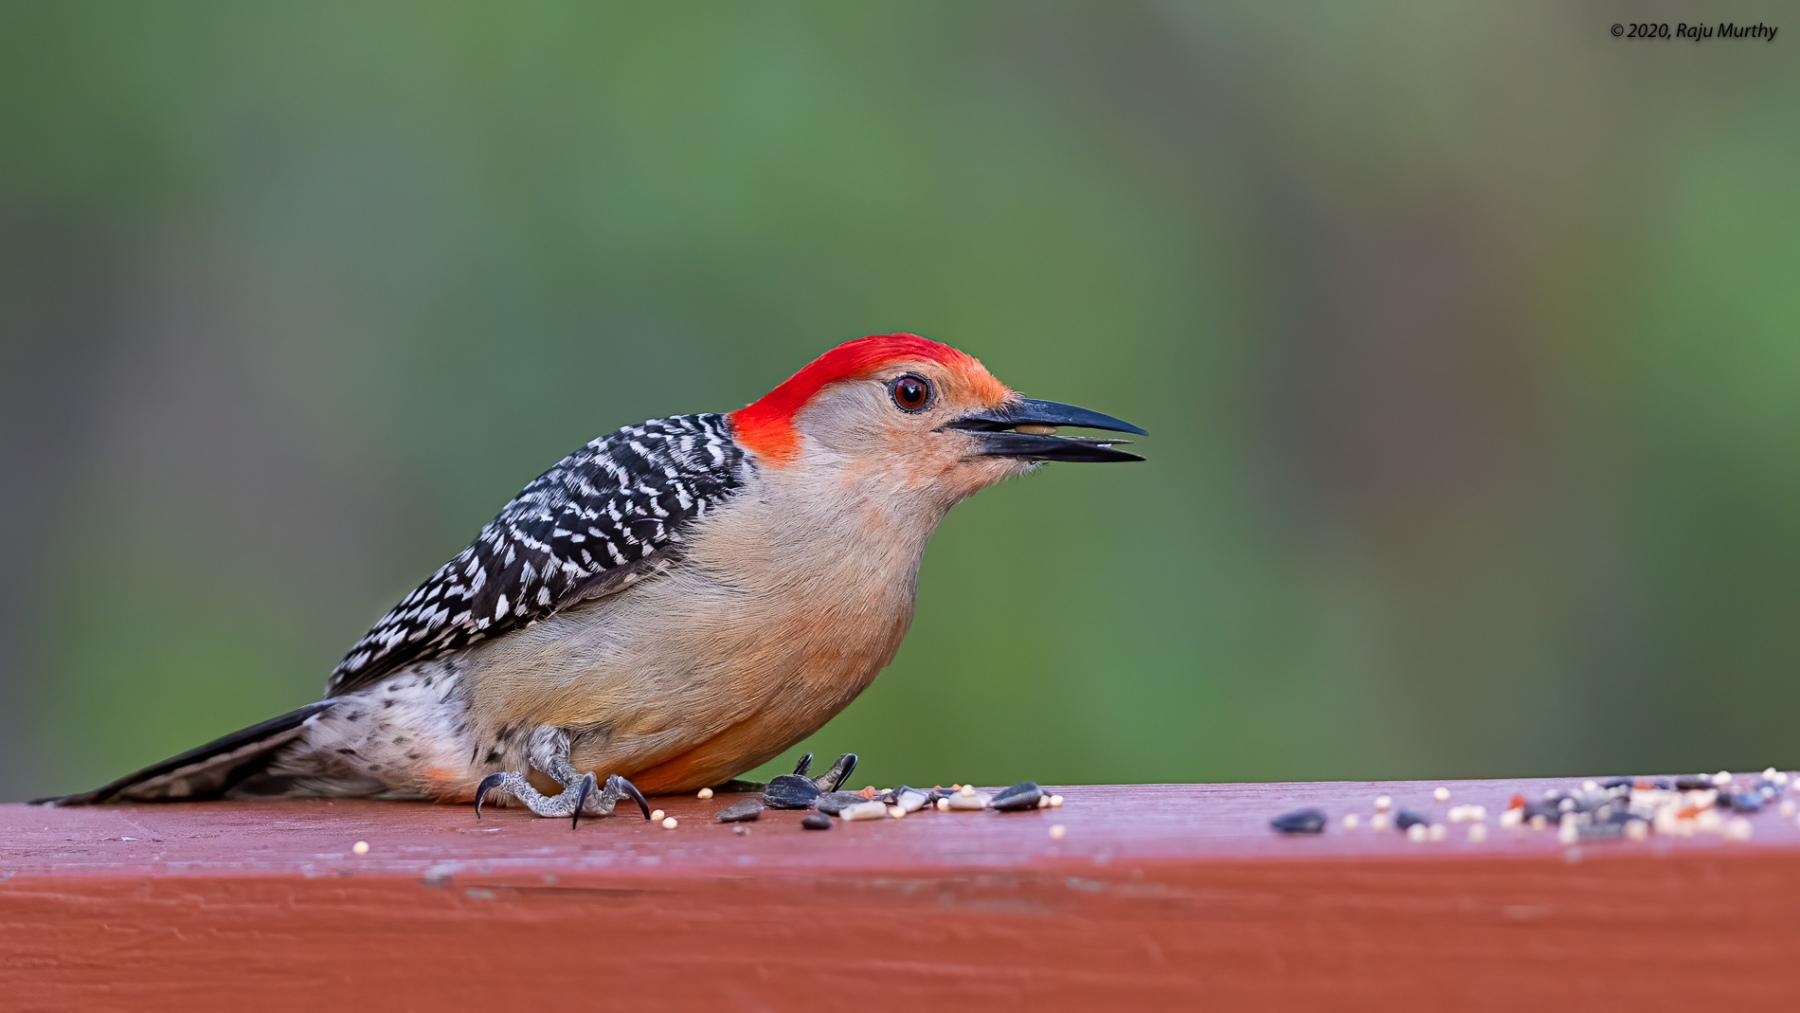 Red-bellied-Woodpecker_H7I3420-Edit